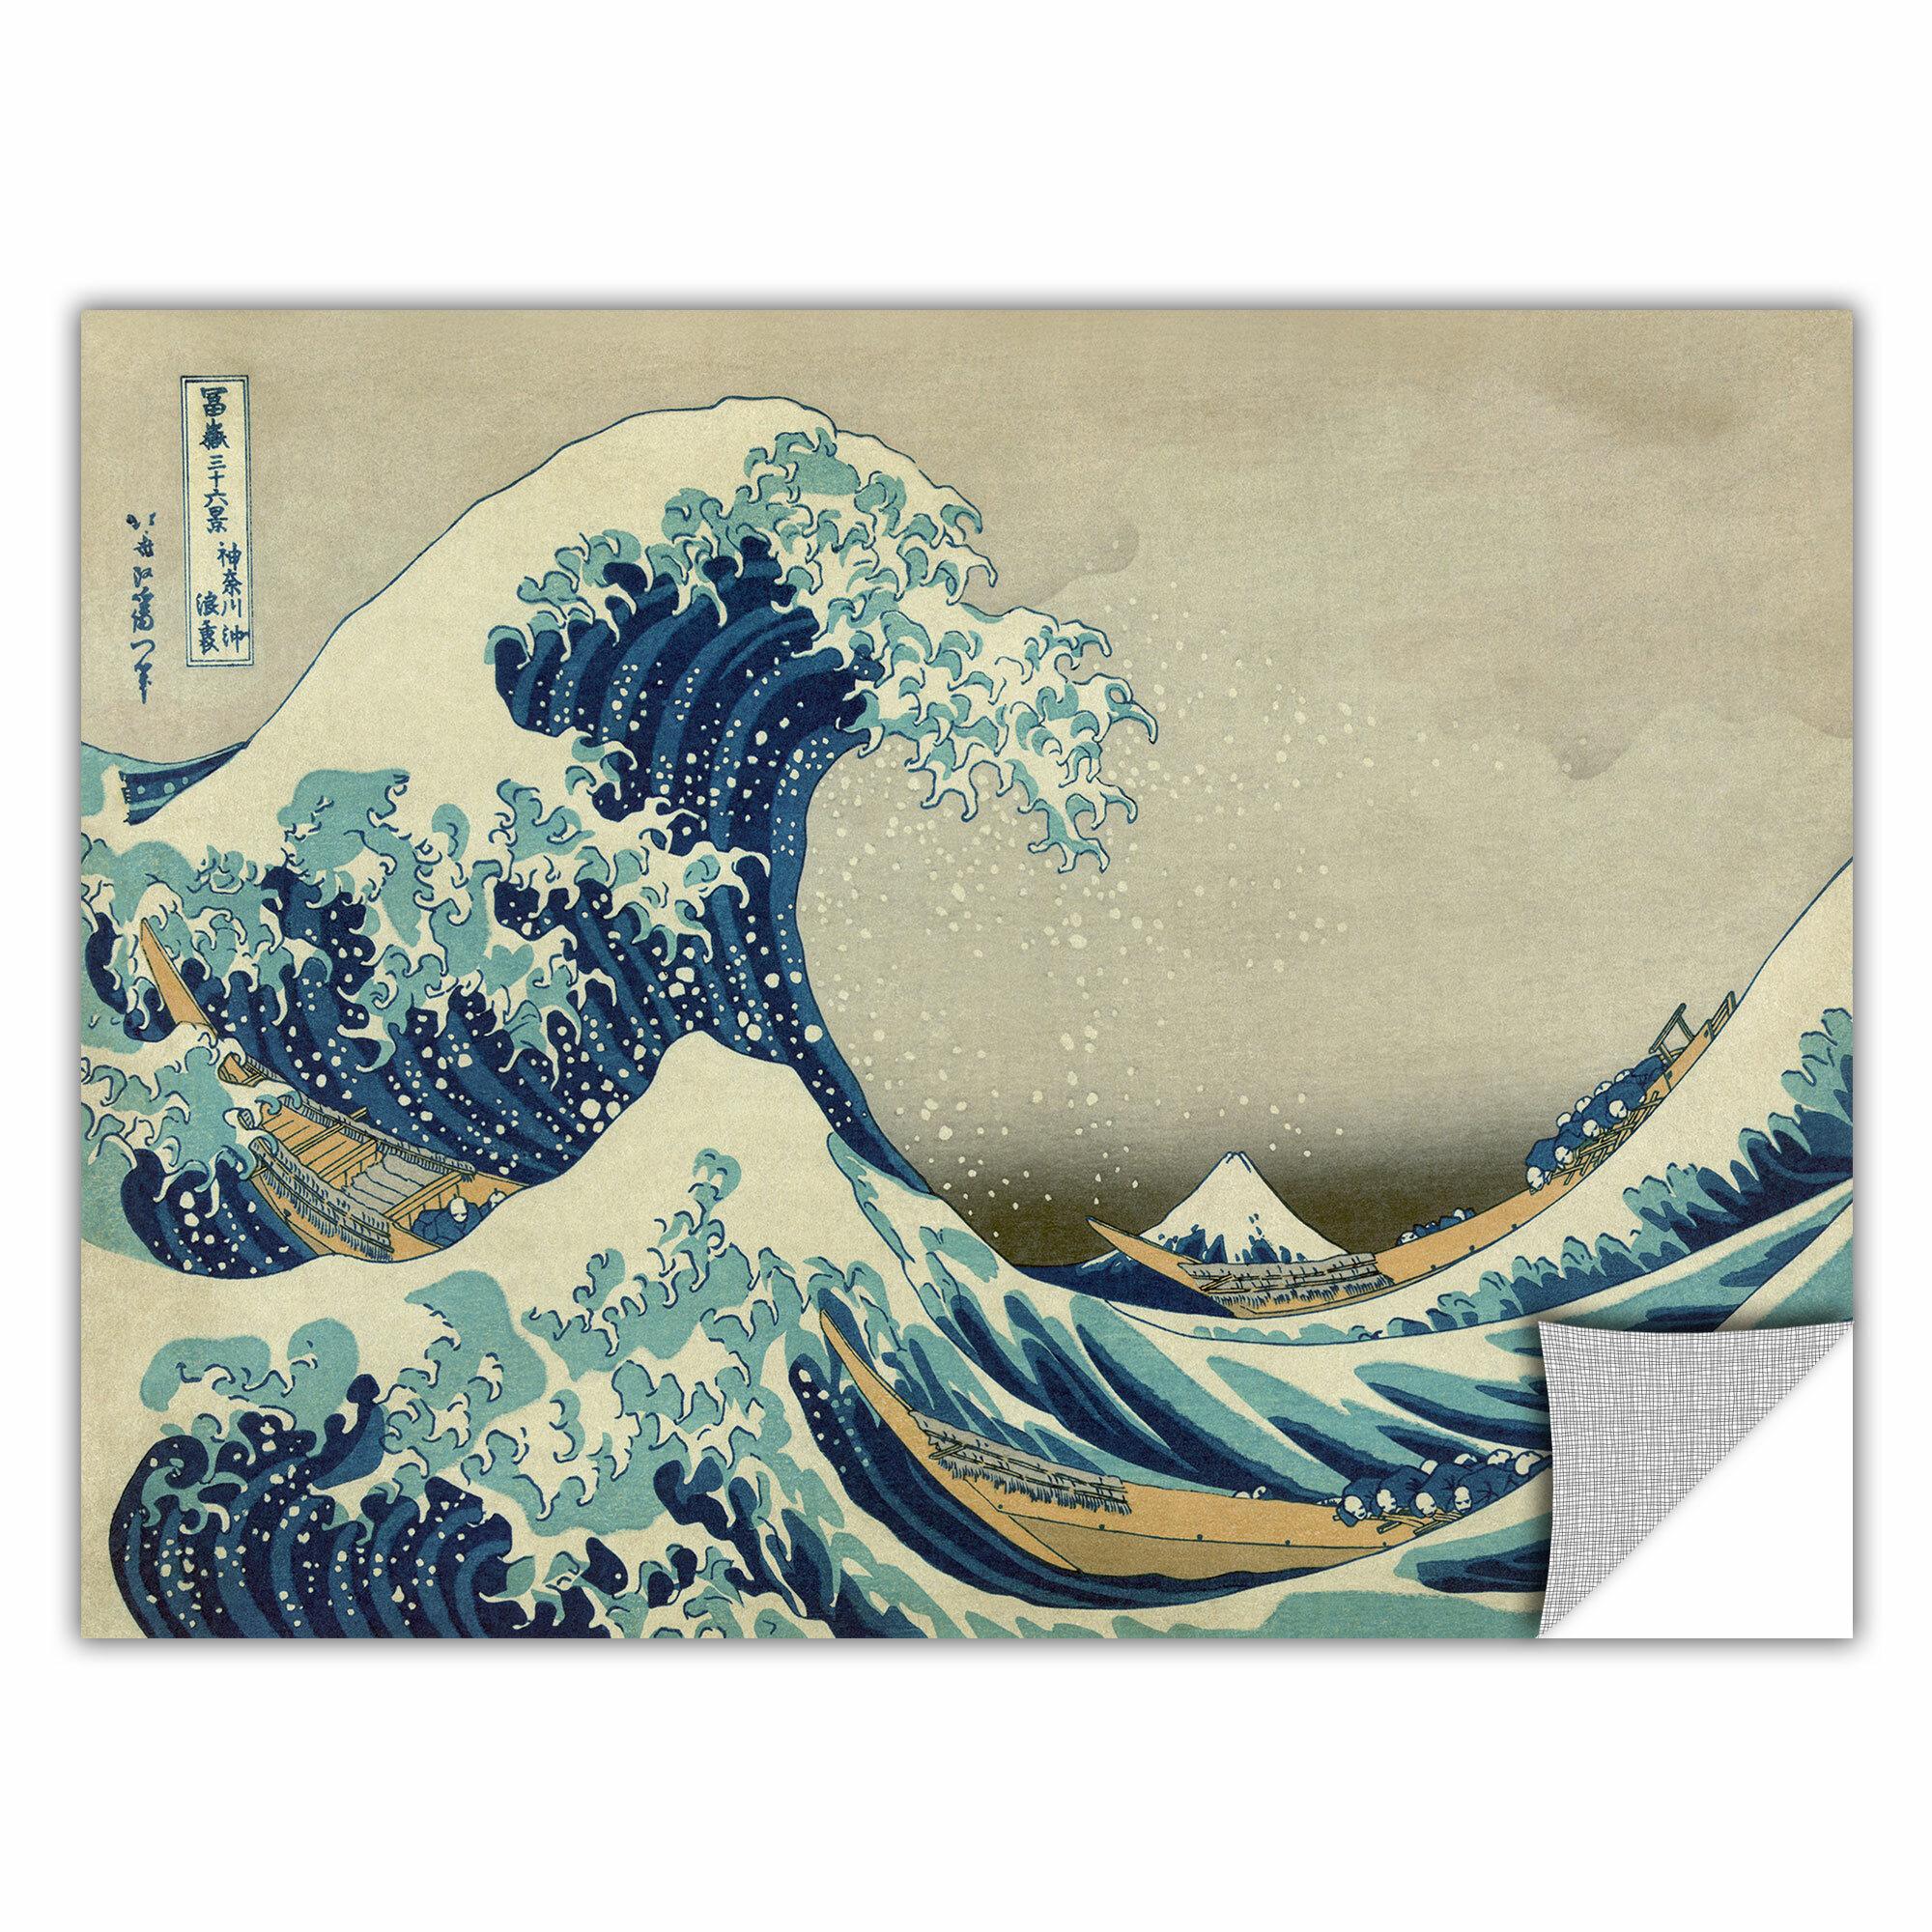 d5725e82a393 ArtWall The Great Wave Off Kanagawa  by Katsushika Hokusai Painting Print  Removable Wall Decal